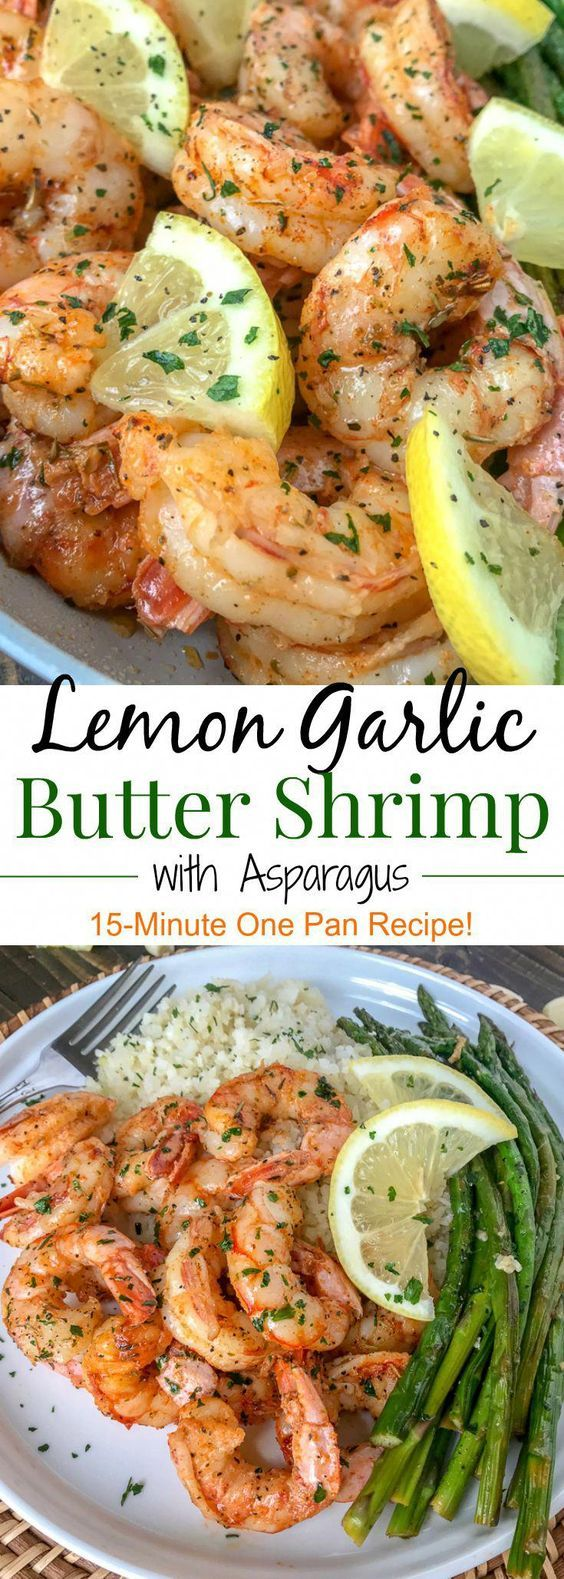 15 Minutes Lemon Garlic Butter Shrimp